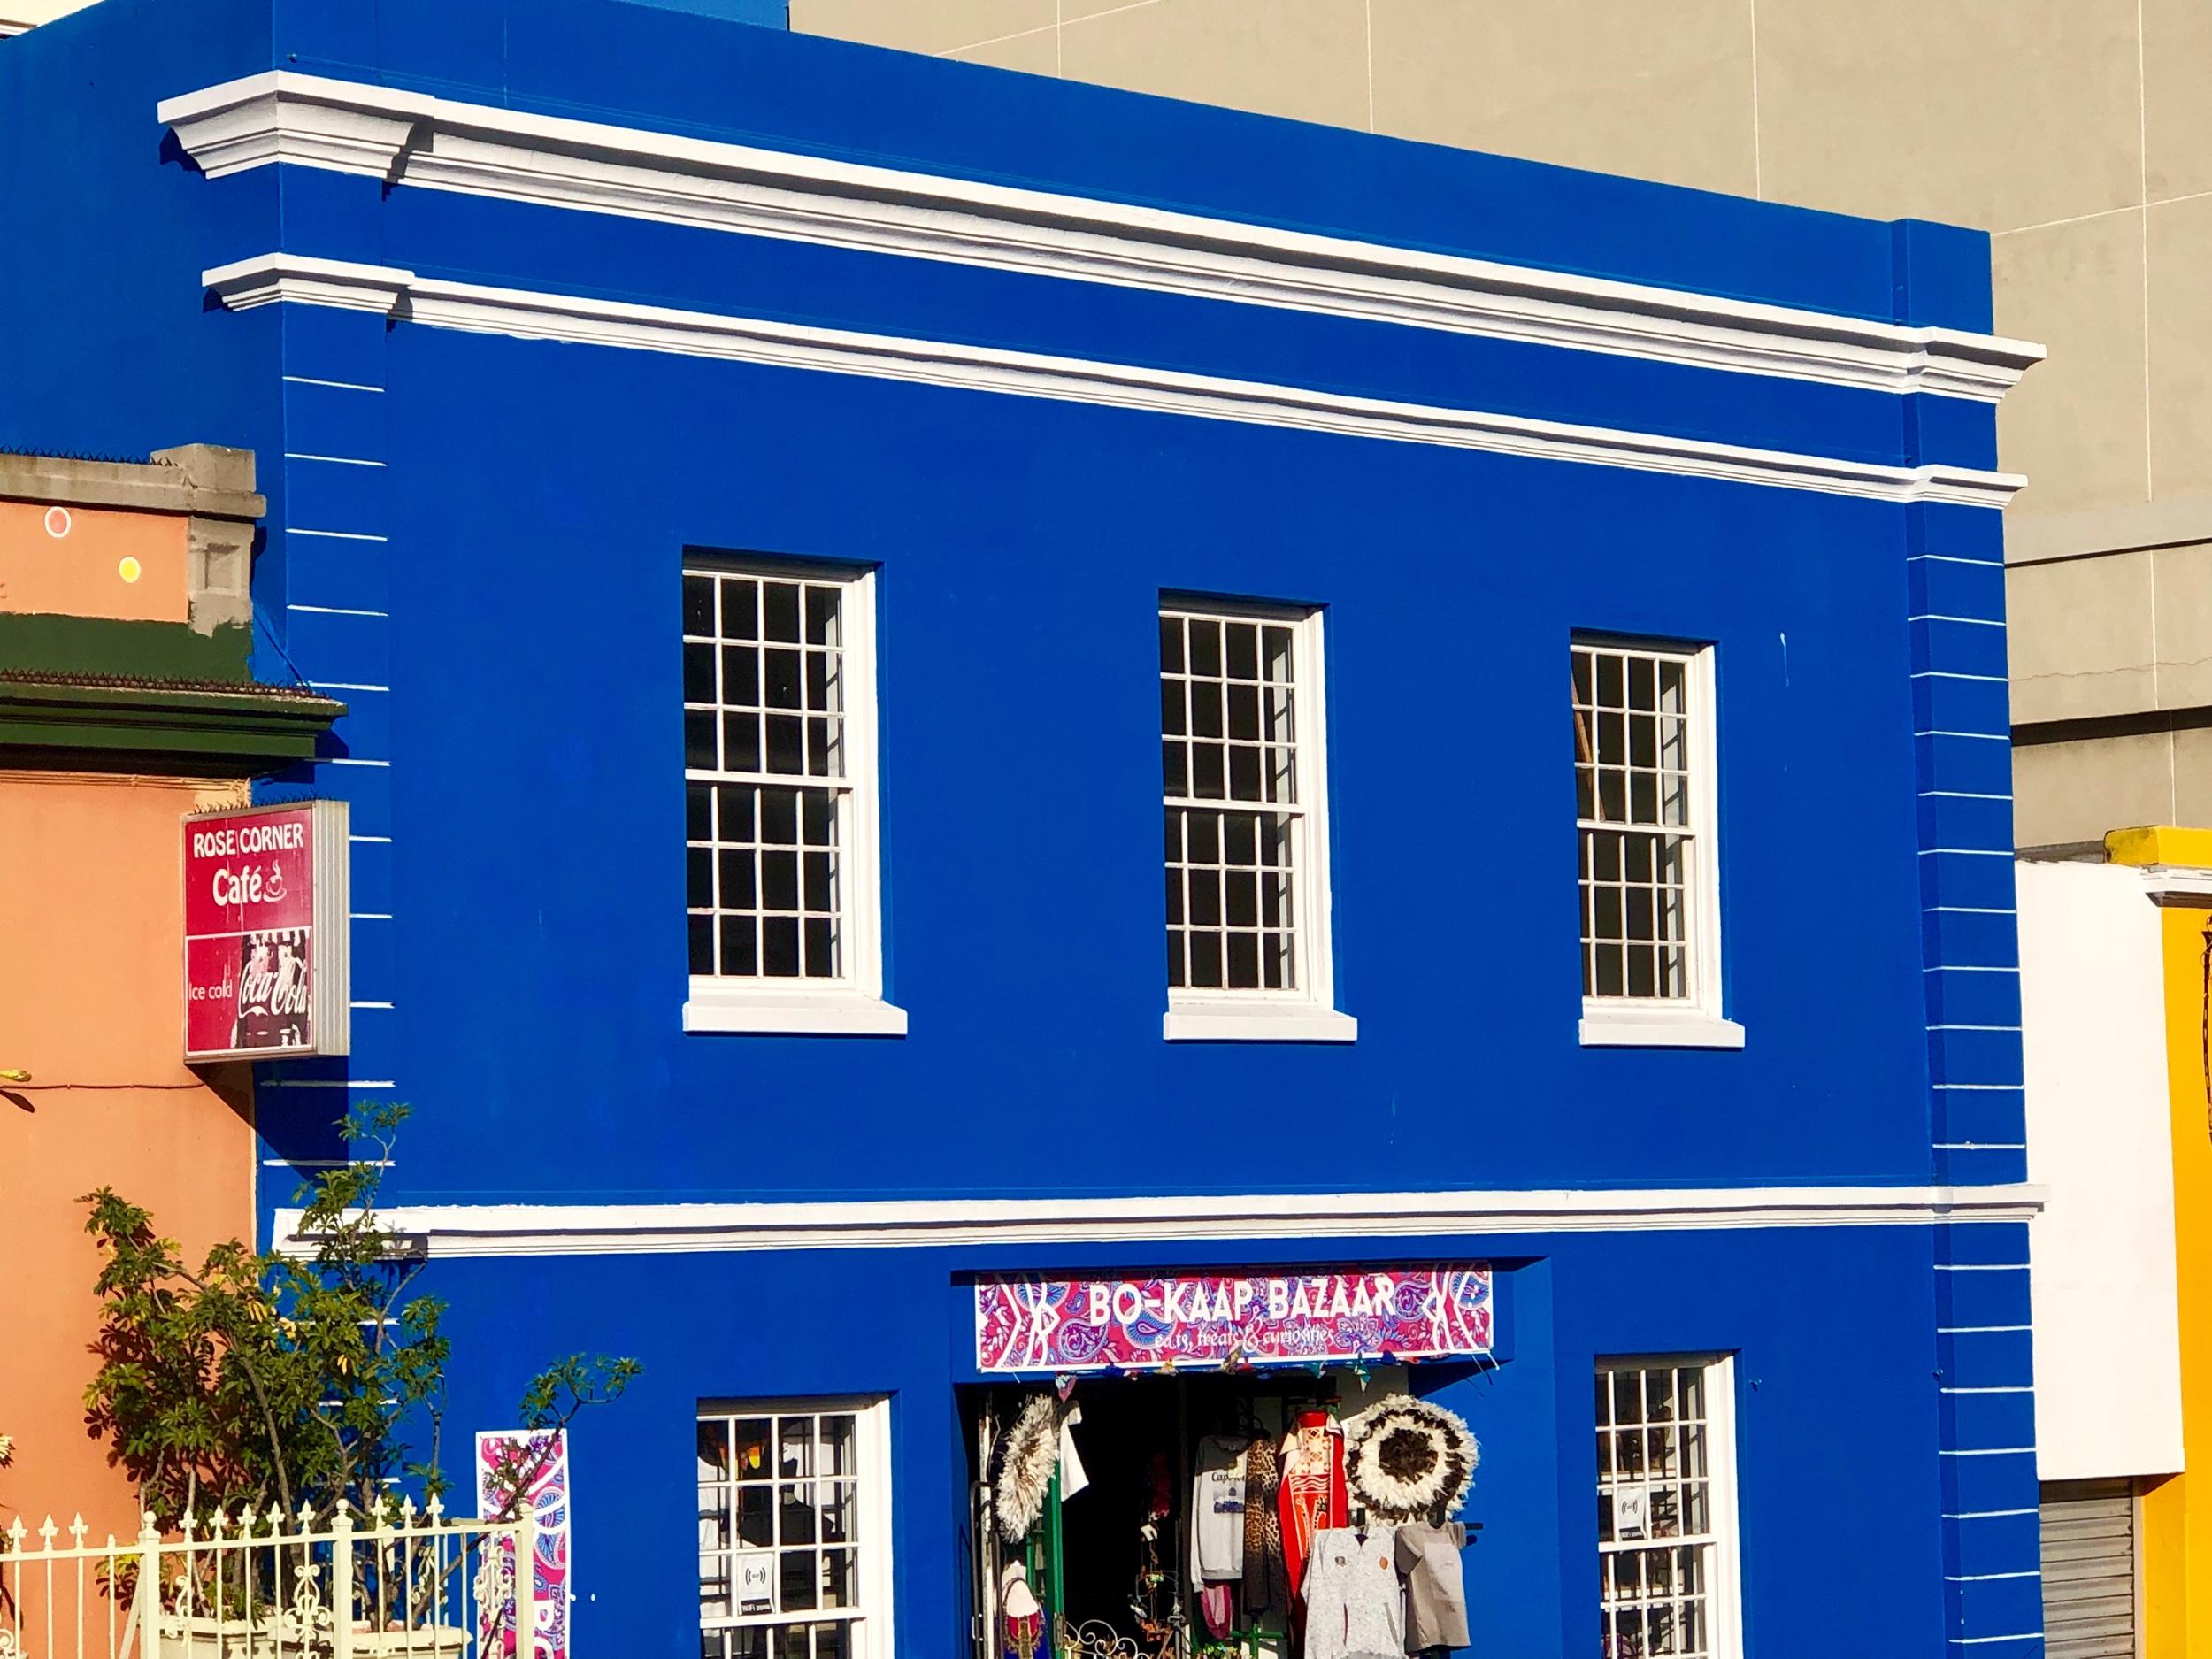 Bo-Kaap Building in Cape Town